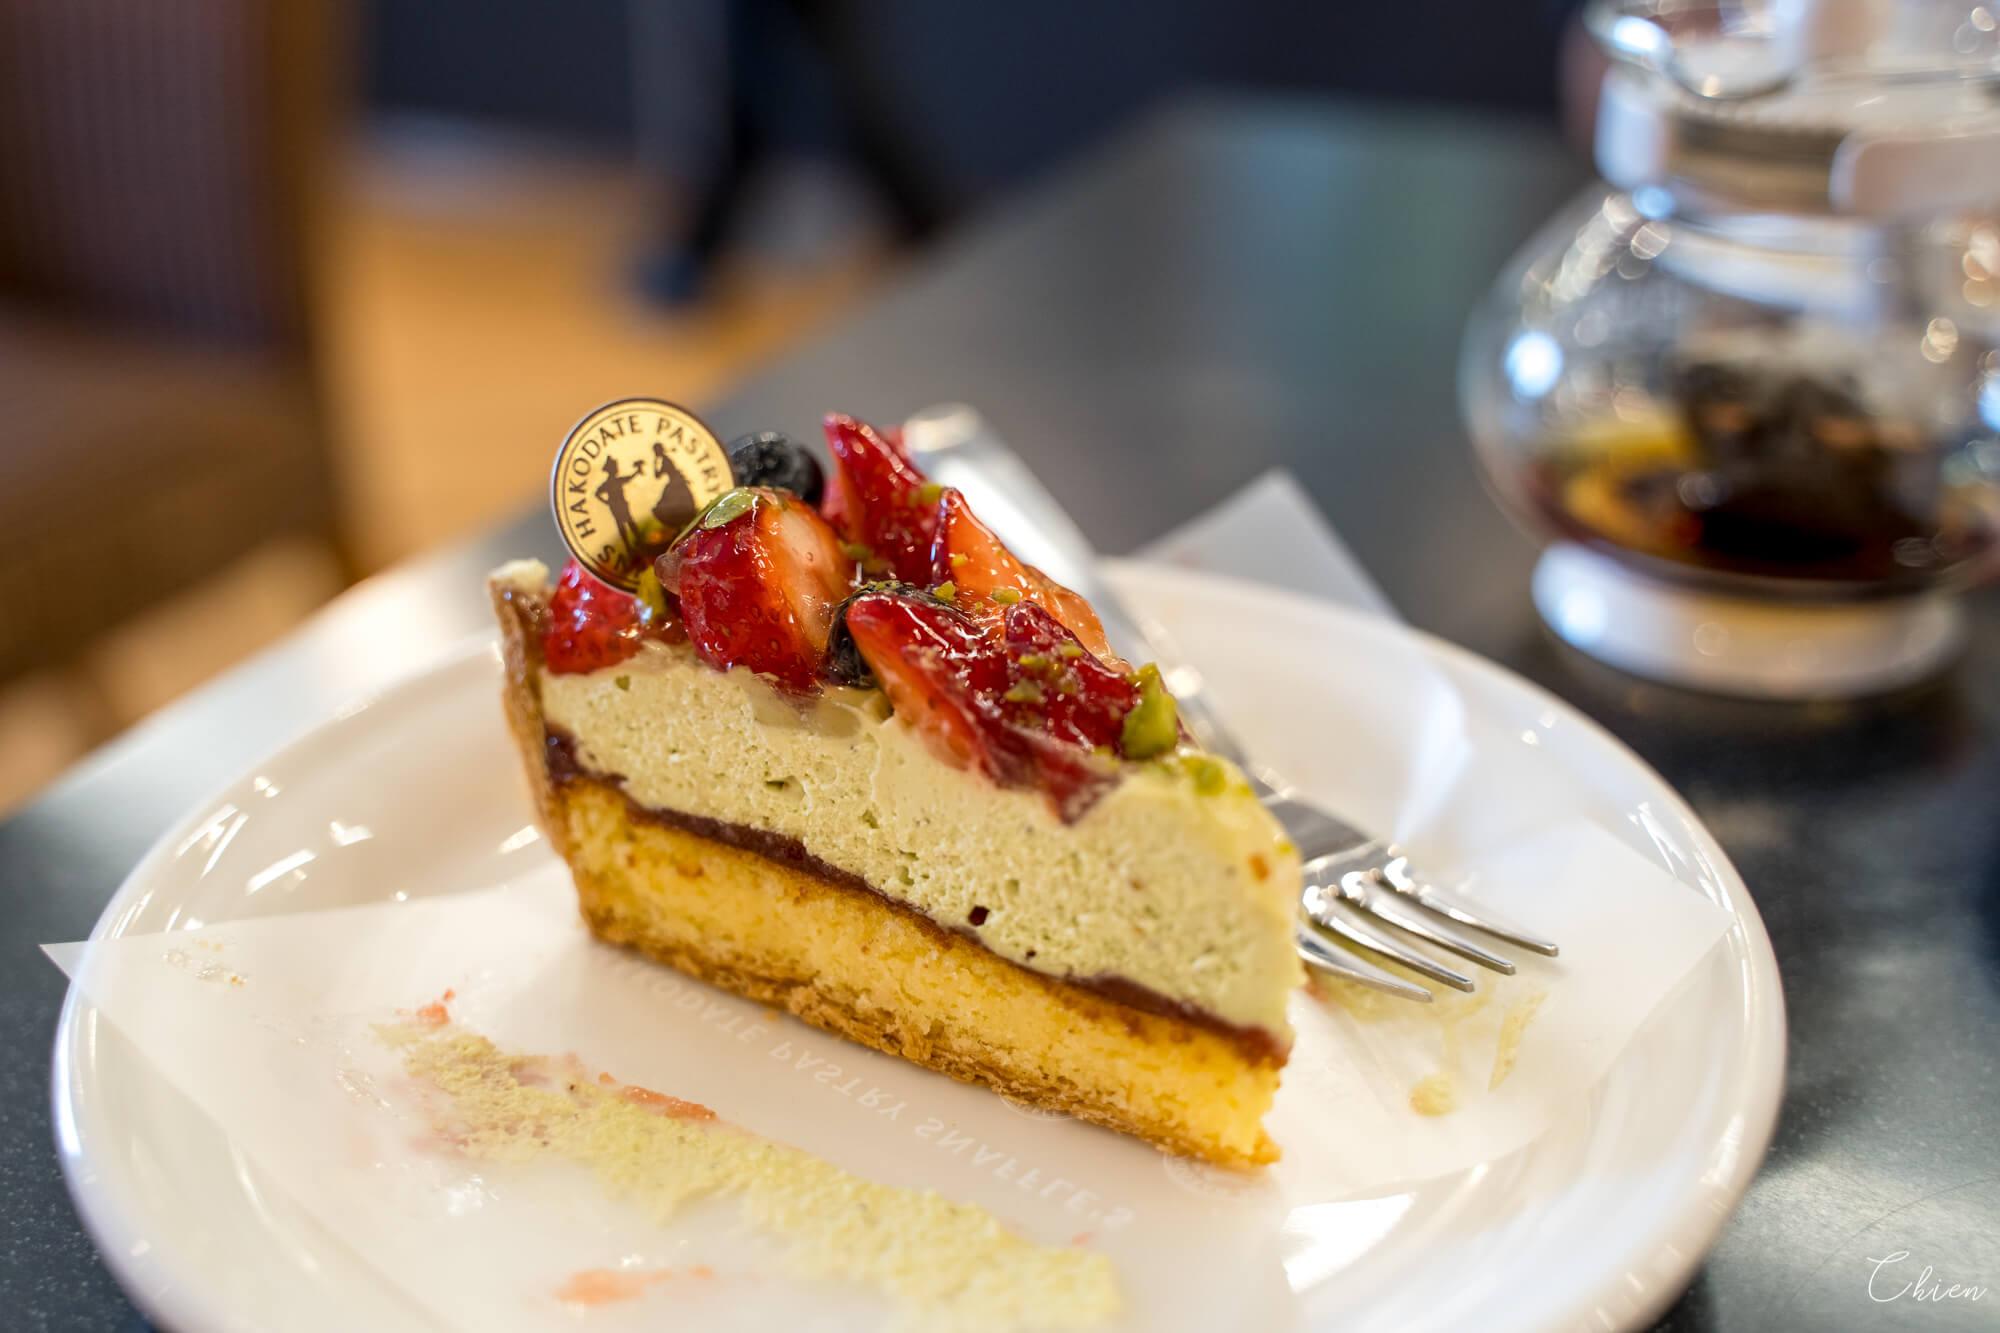 函館下午茶 PASTRY SNAFFLE'S開心果蛋糕